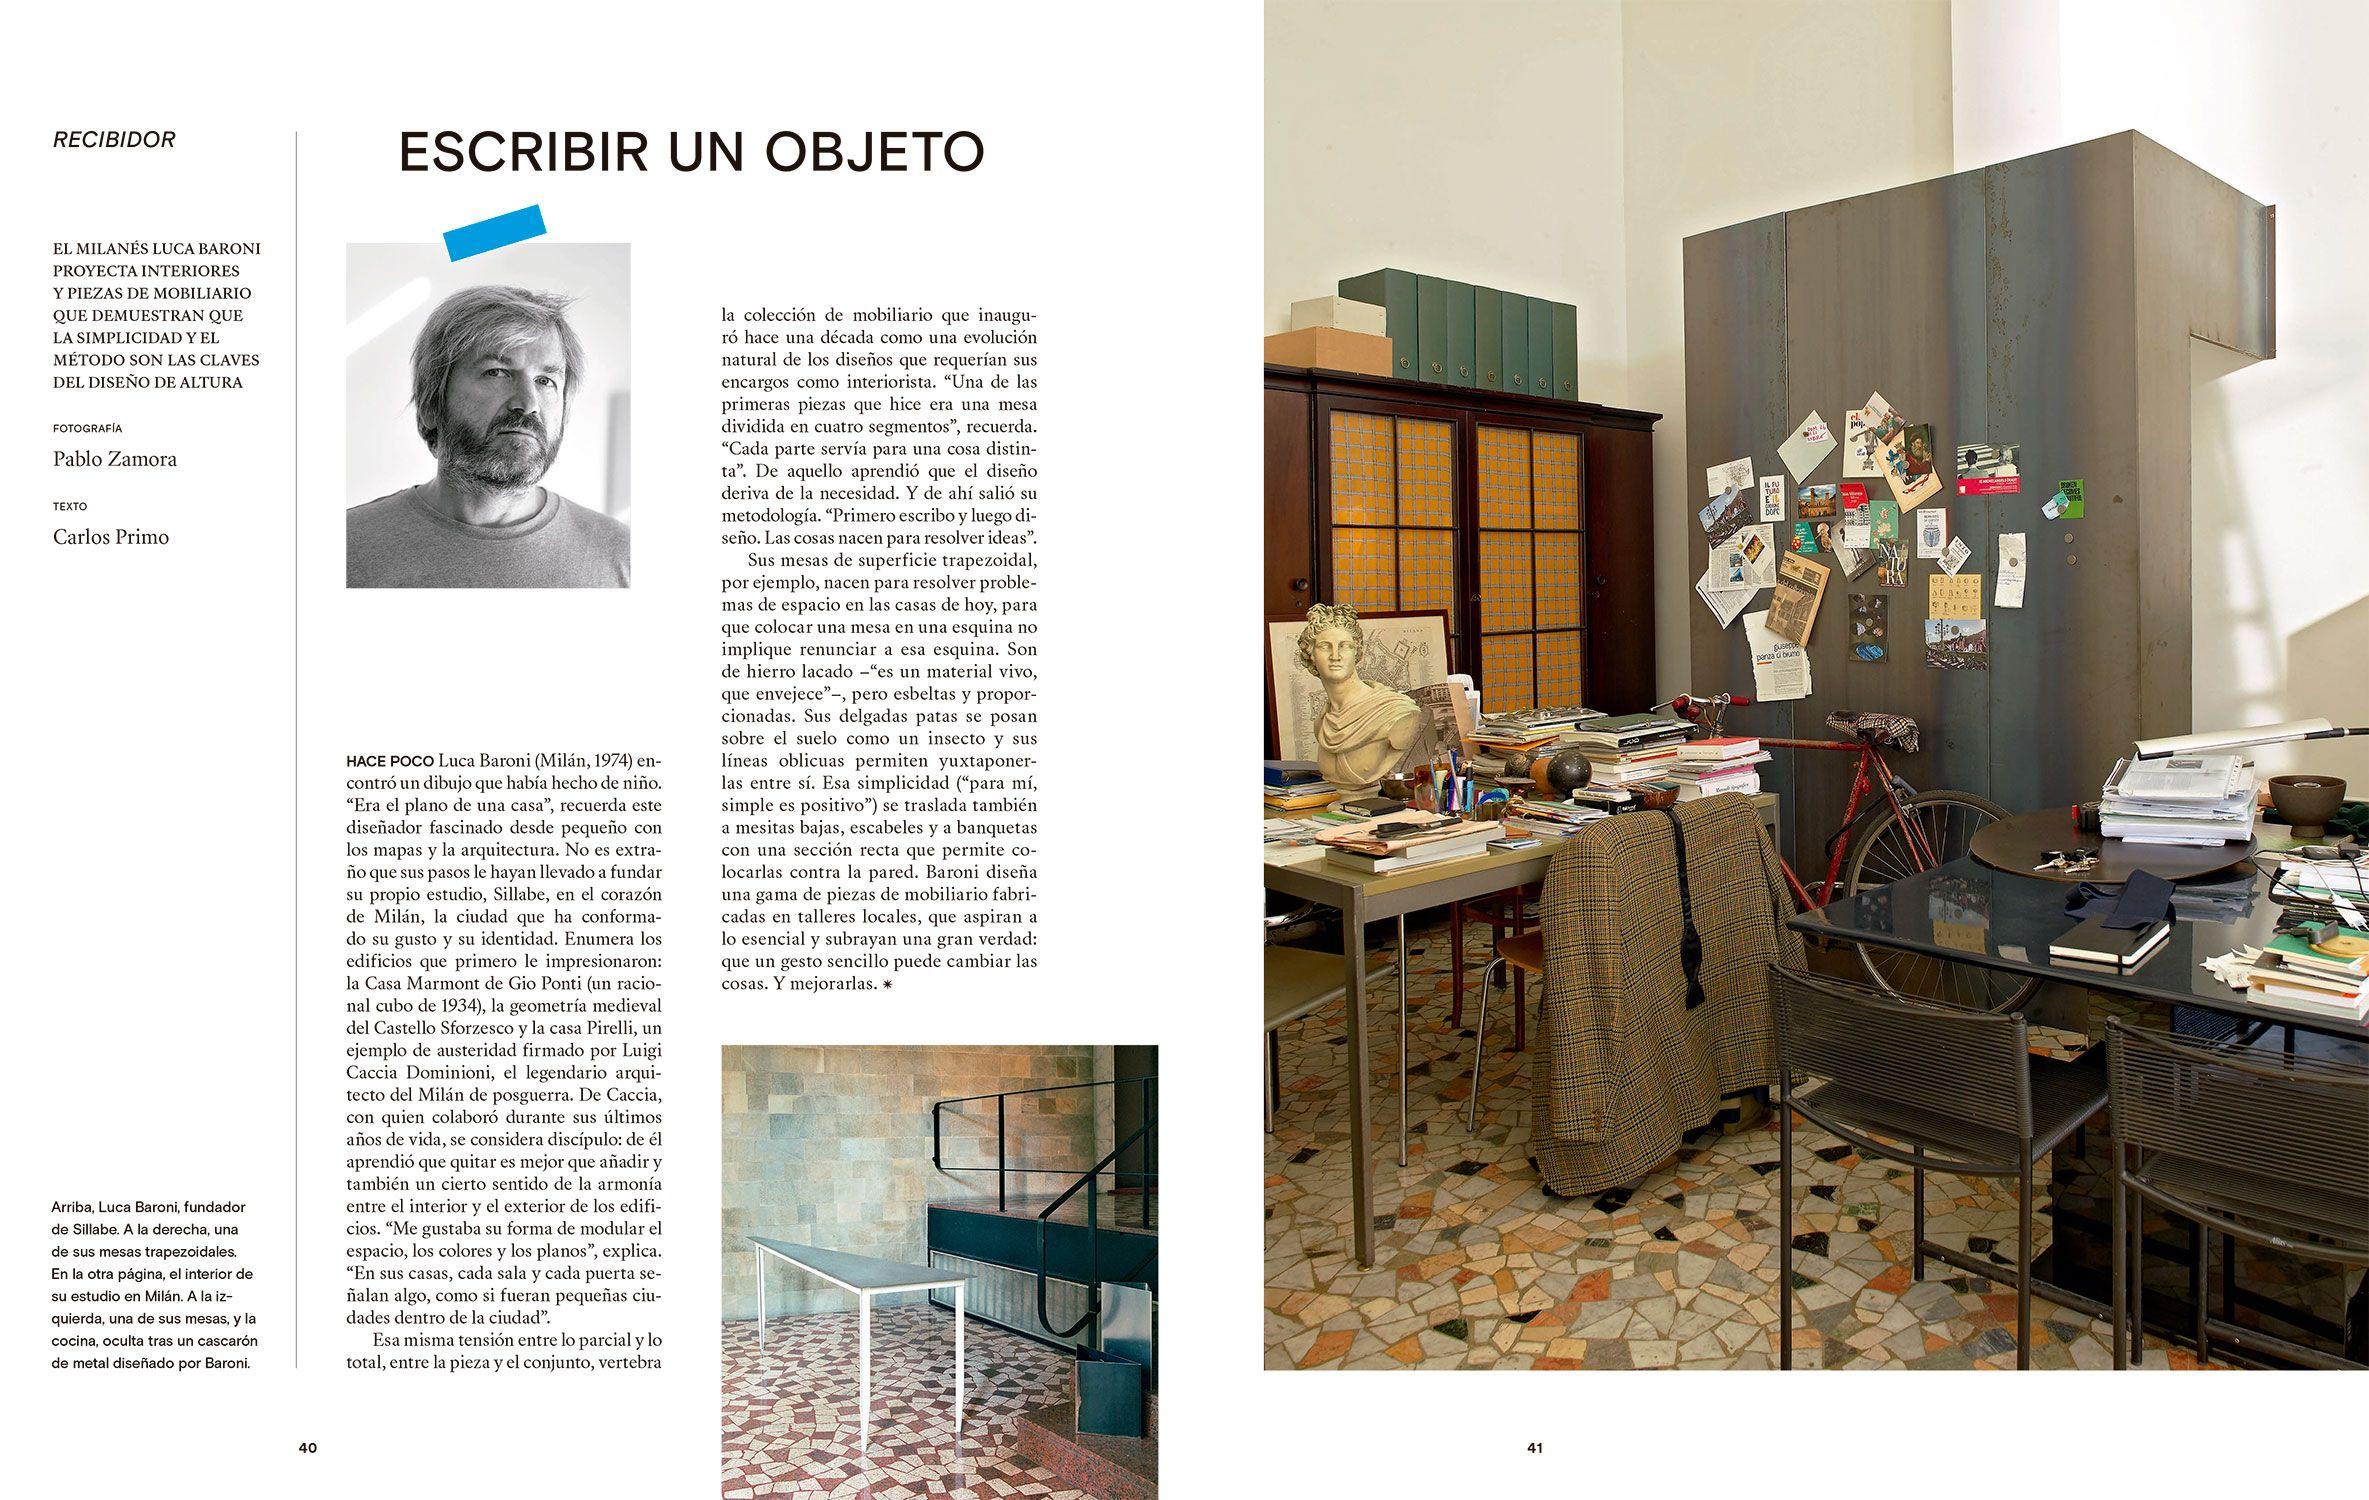 Sillabe Luca Baroni Press Icon Desing 3